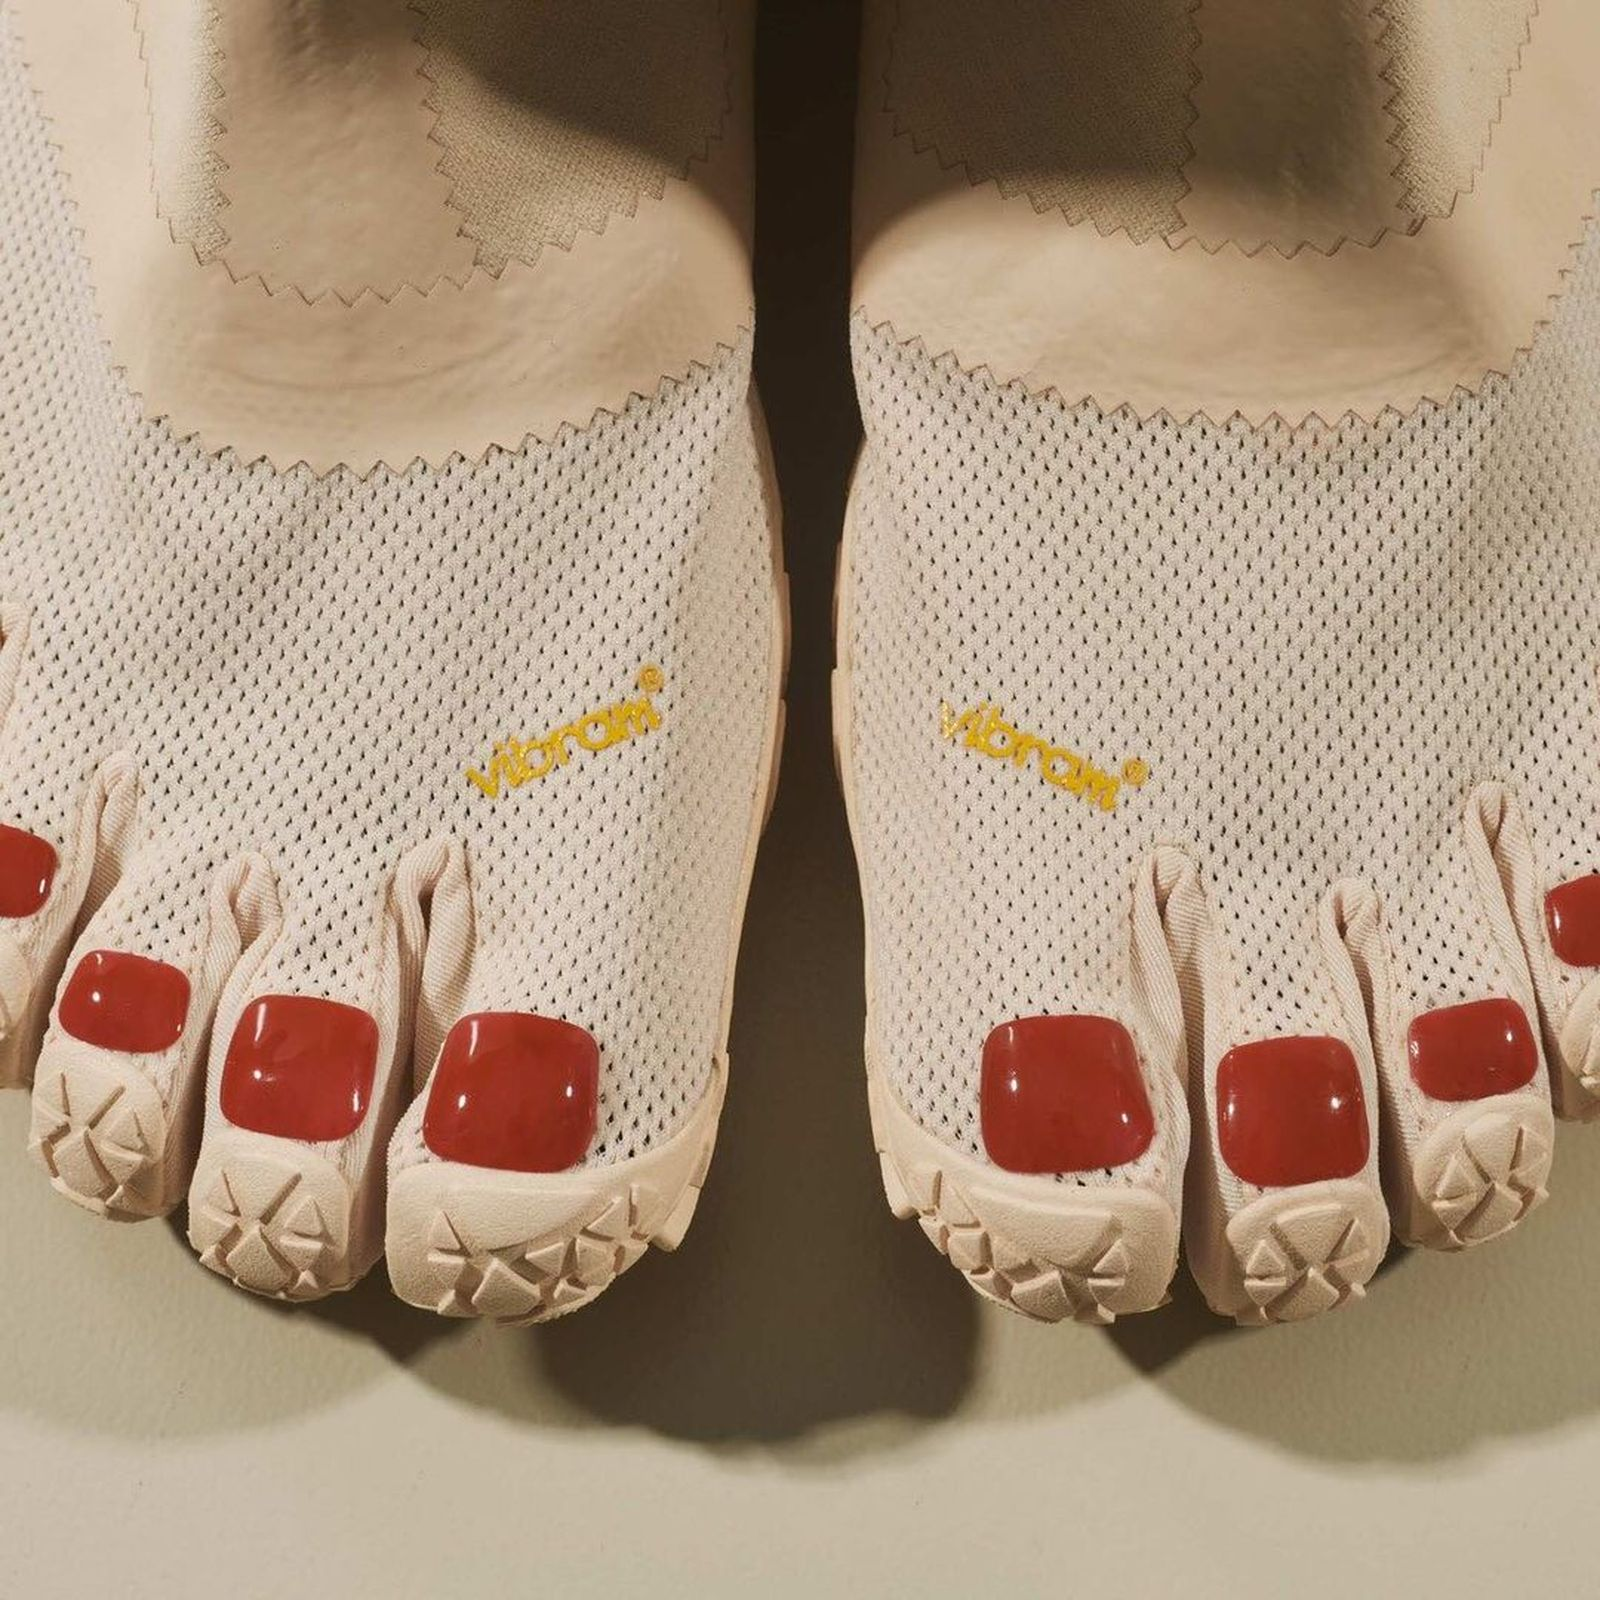 vibram-suicoke-midorikawa-toe-shoe-02